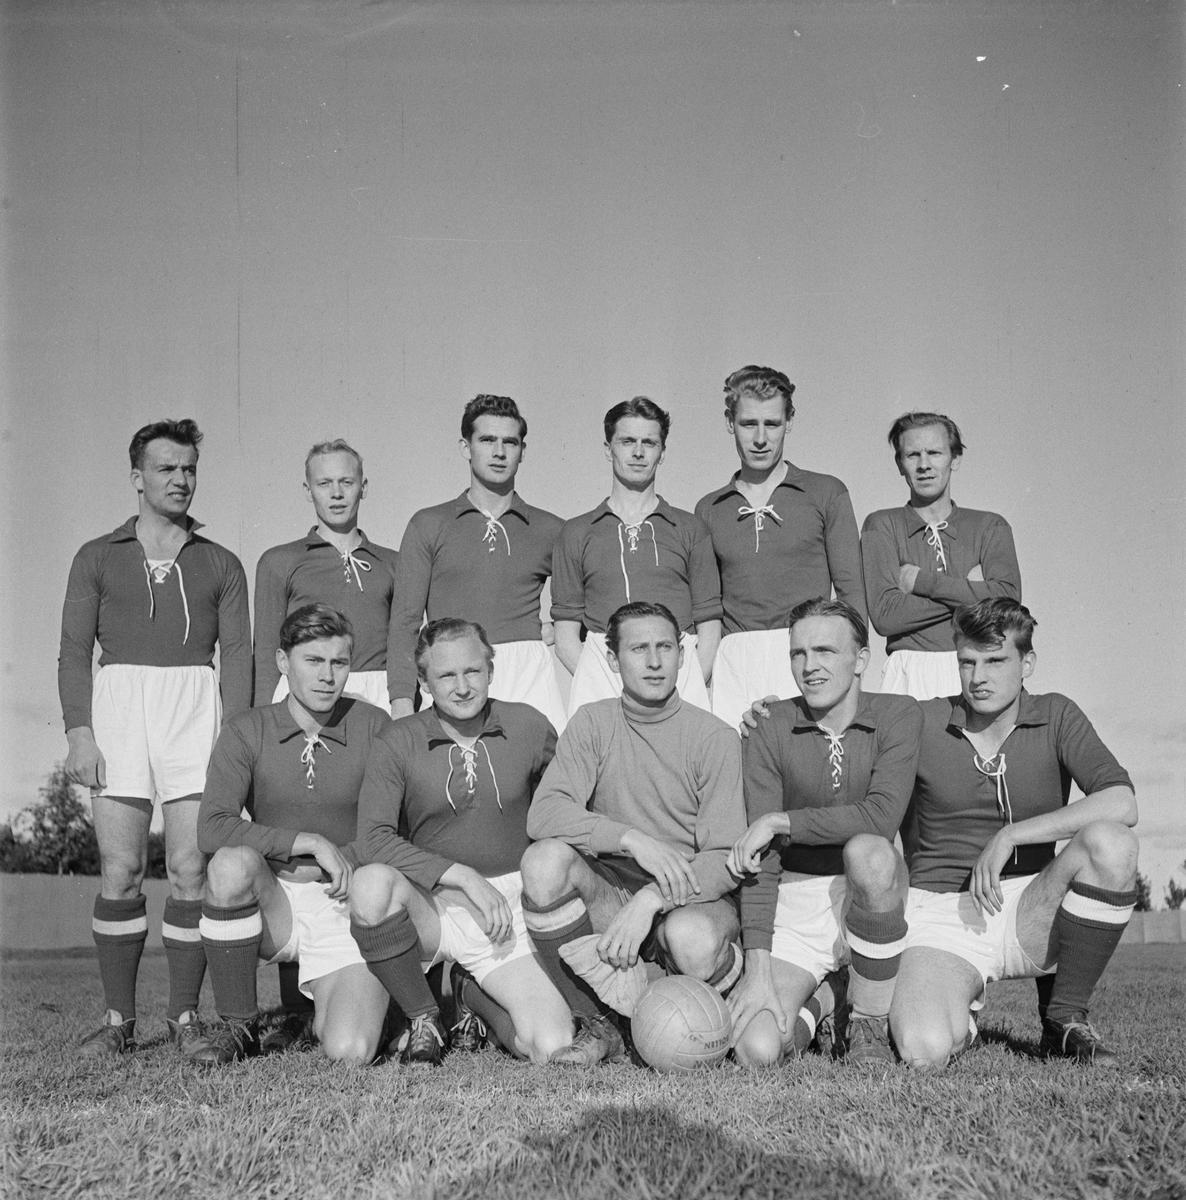 Korpfotboll, Uppsala-Gävle, sannolikt Ekebyvallen, Flogsta, Uppsala 1954